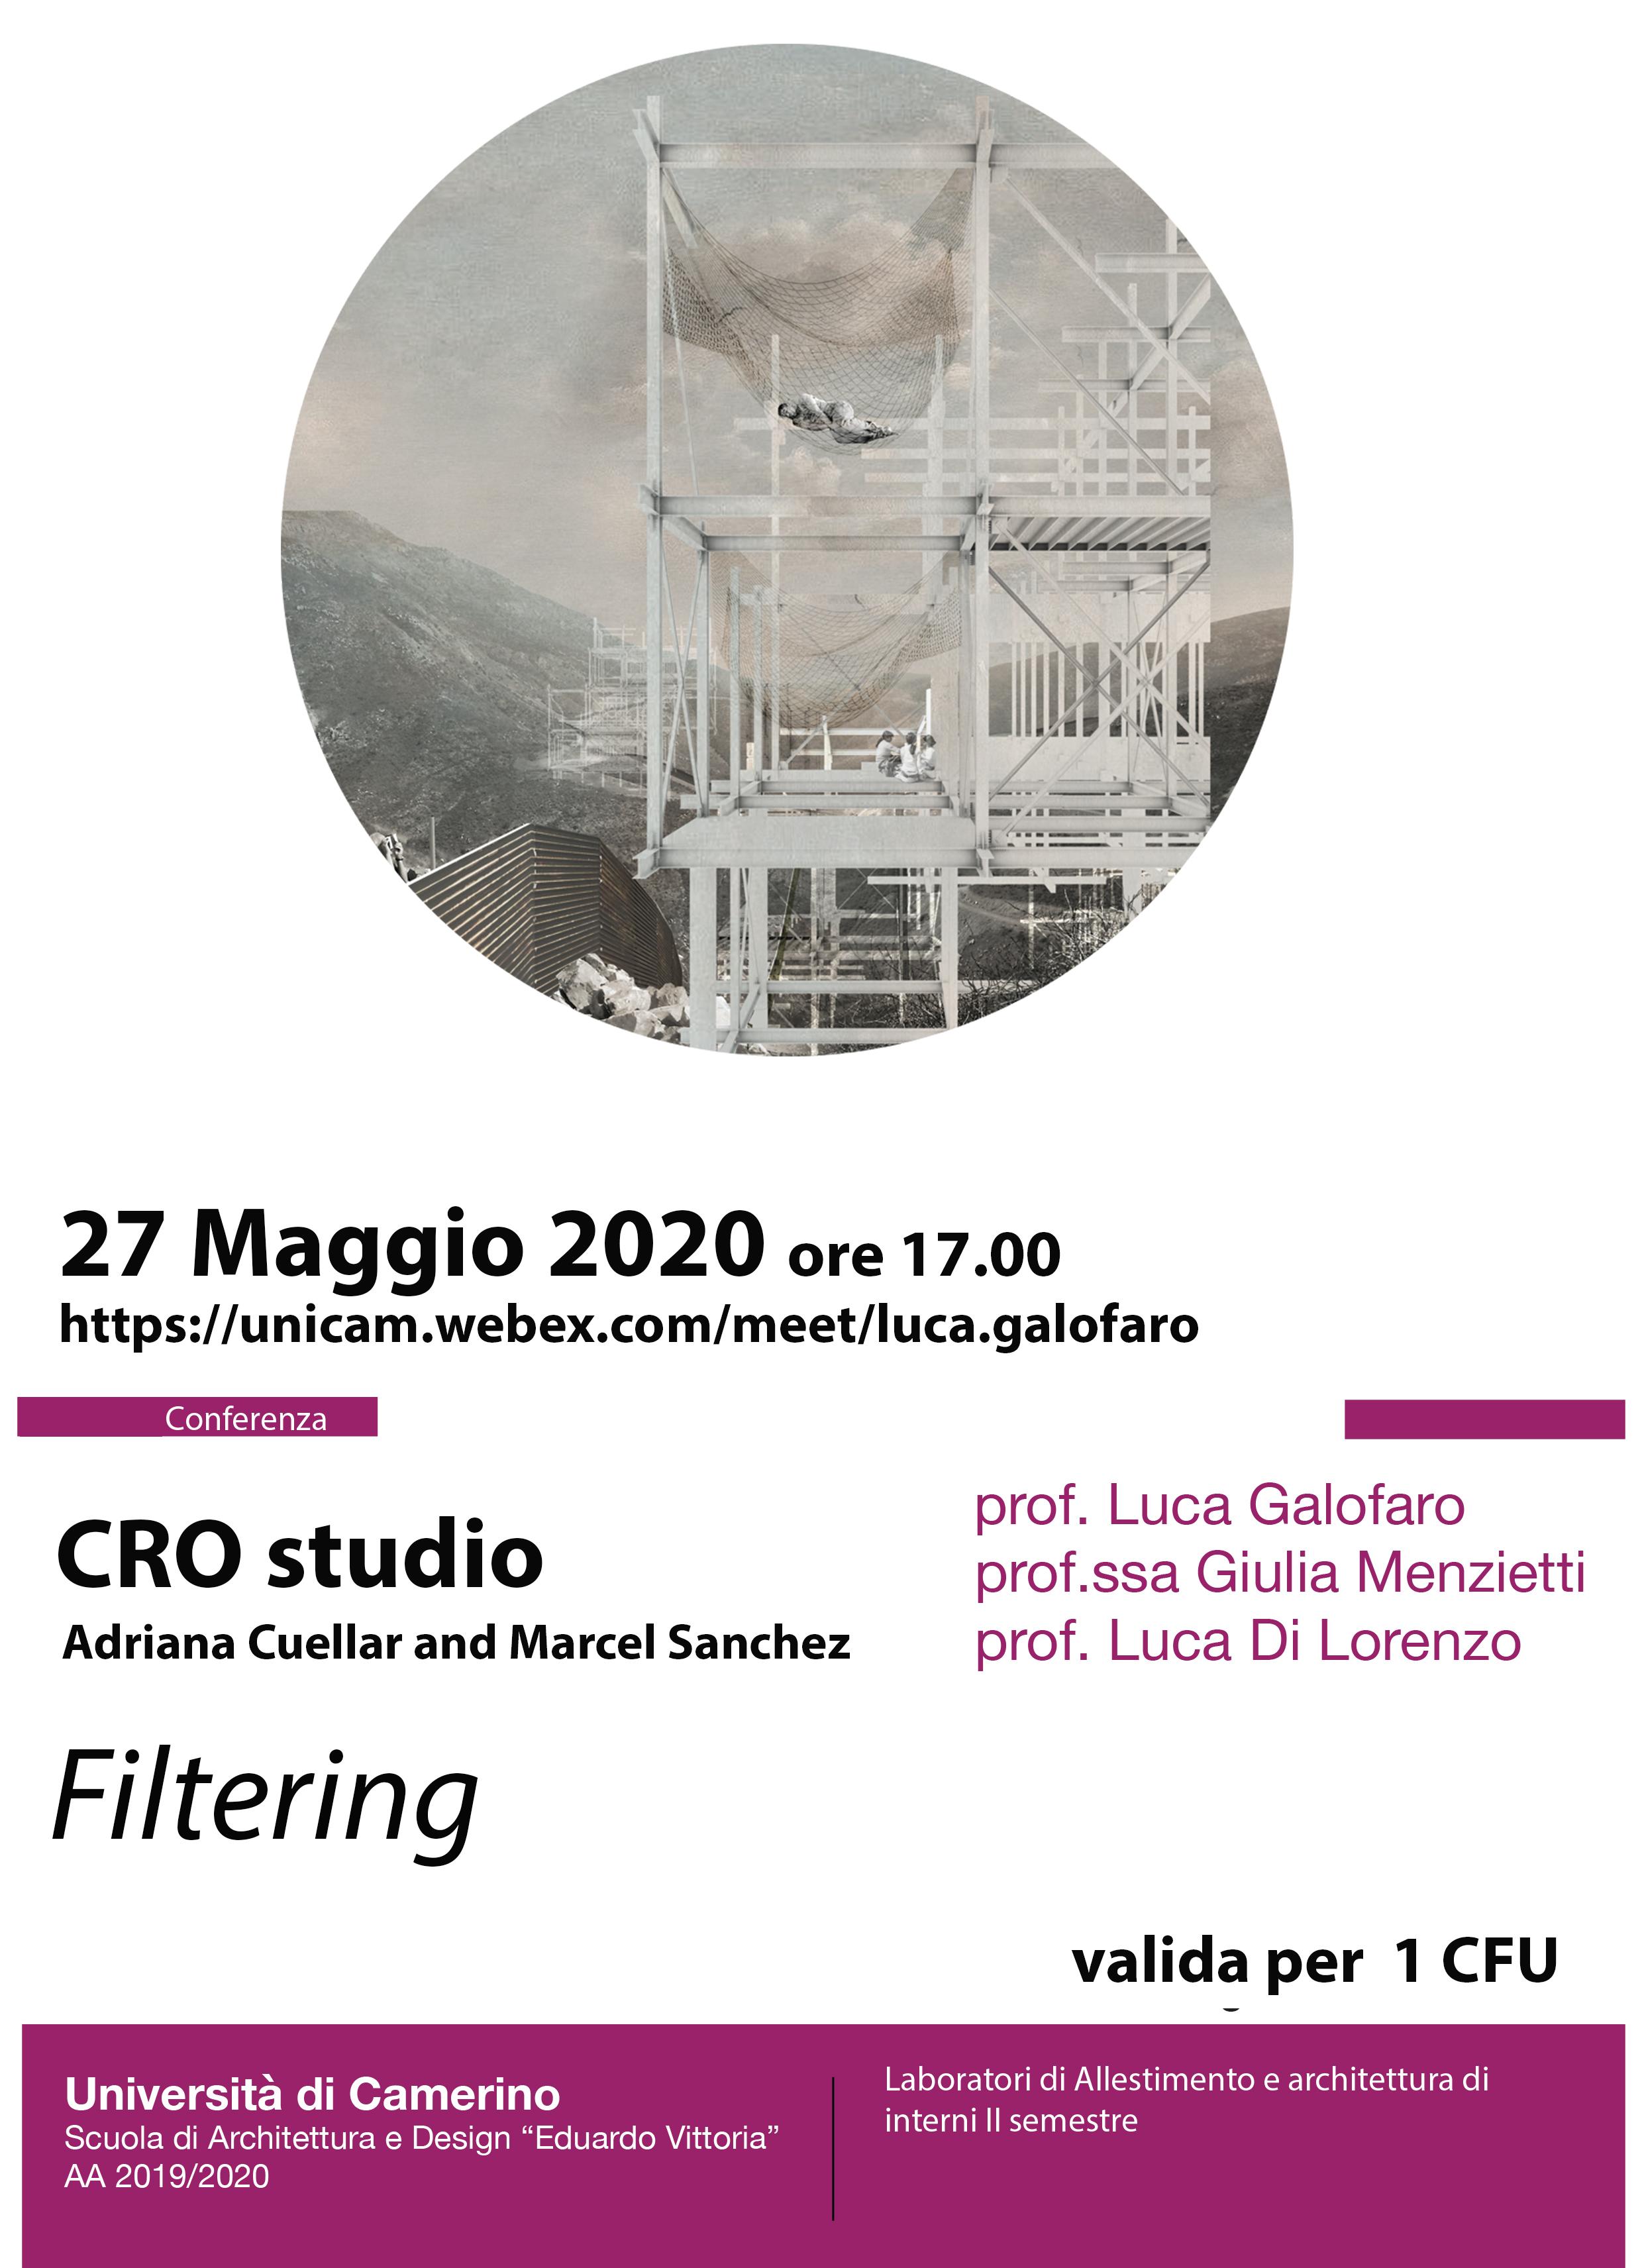 locandina manifesto filtering cro